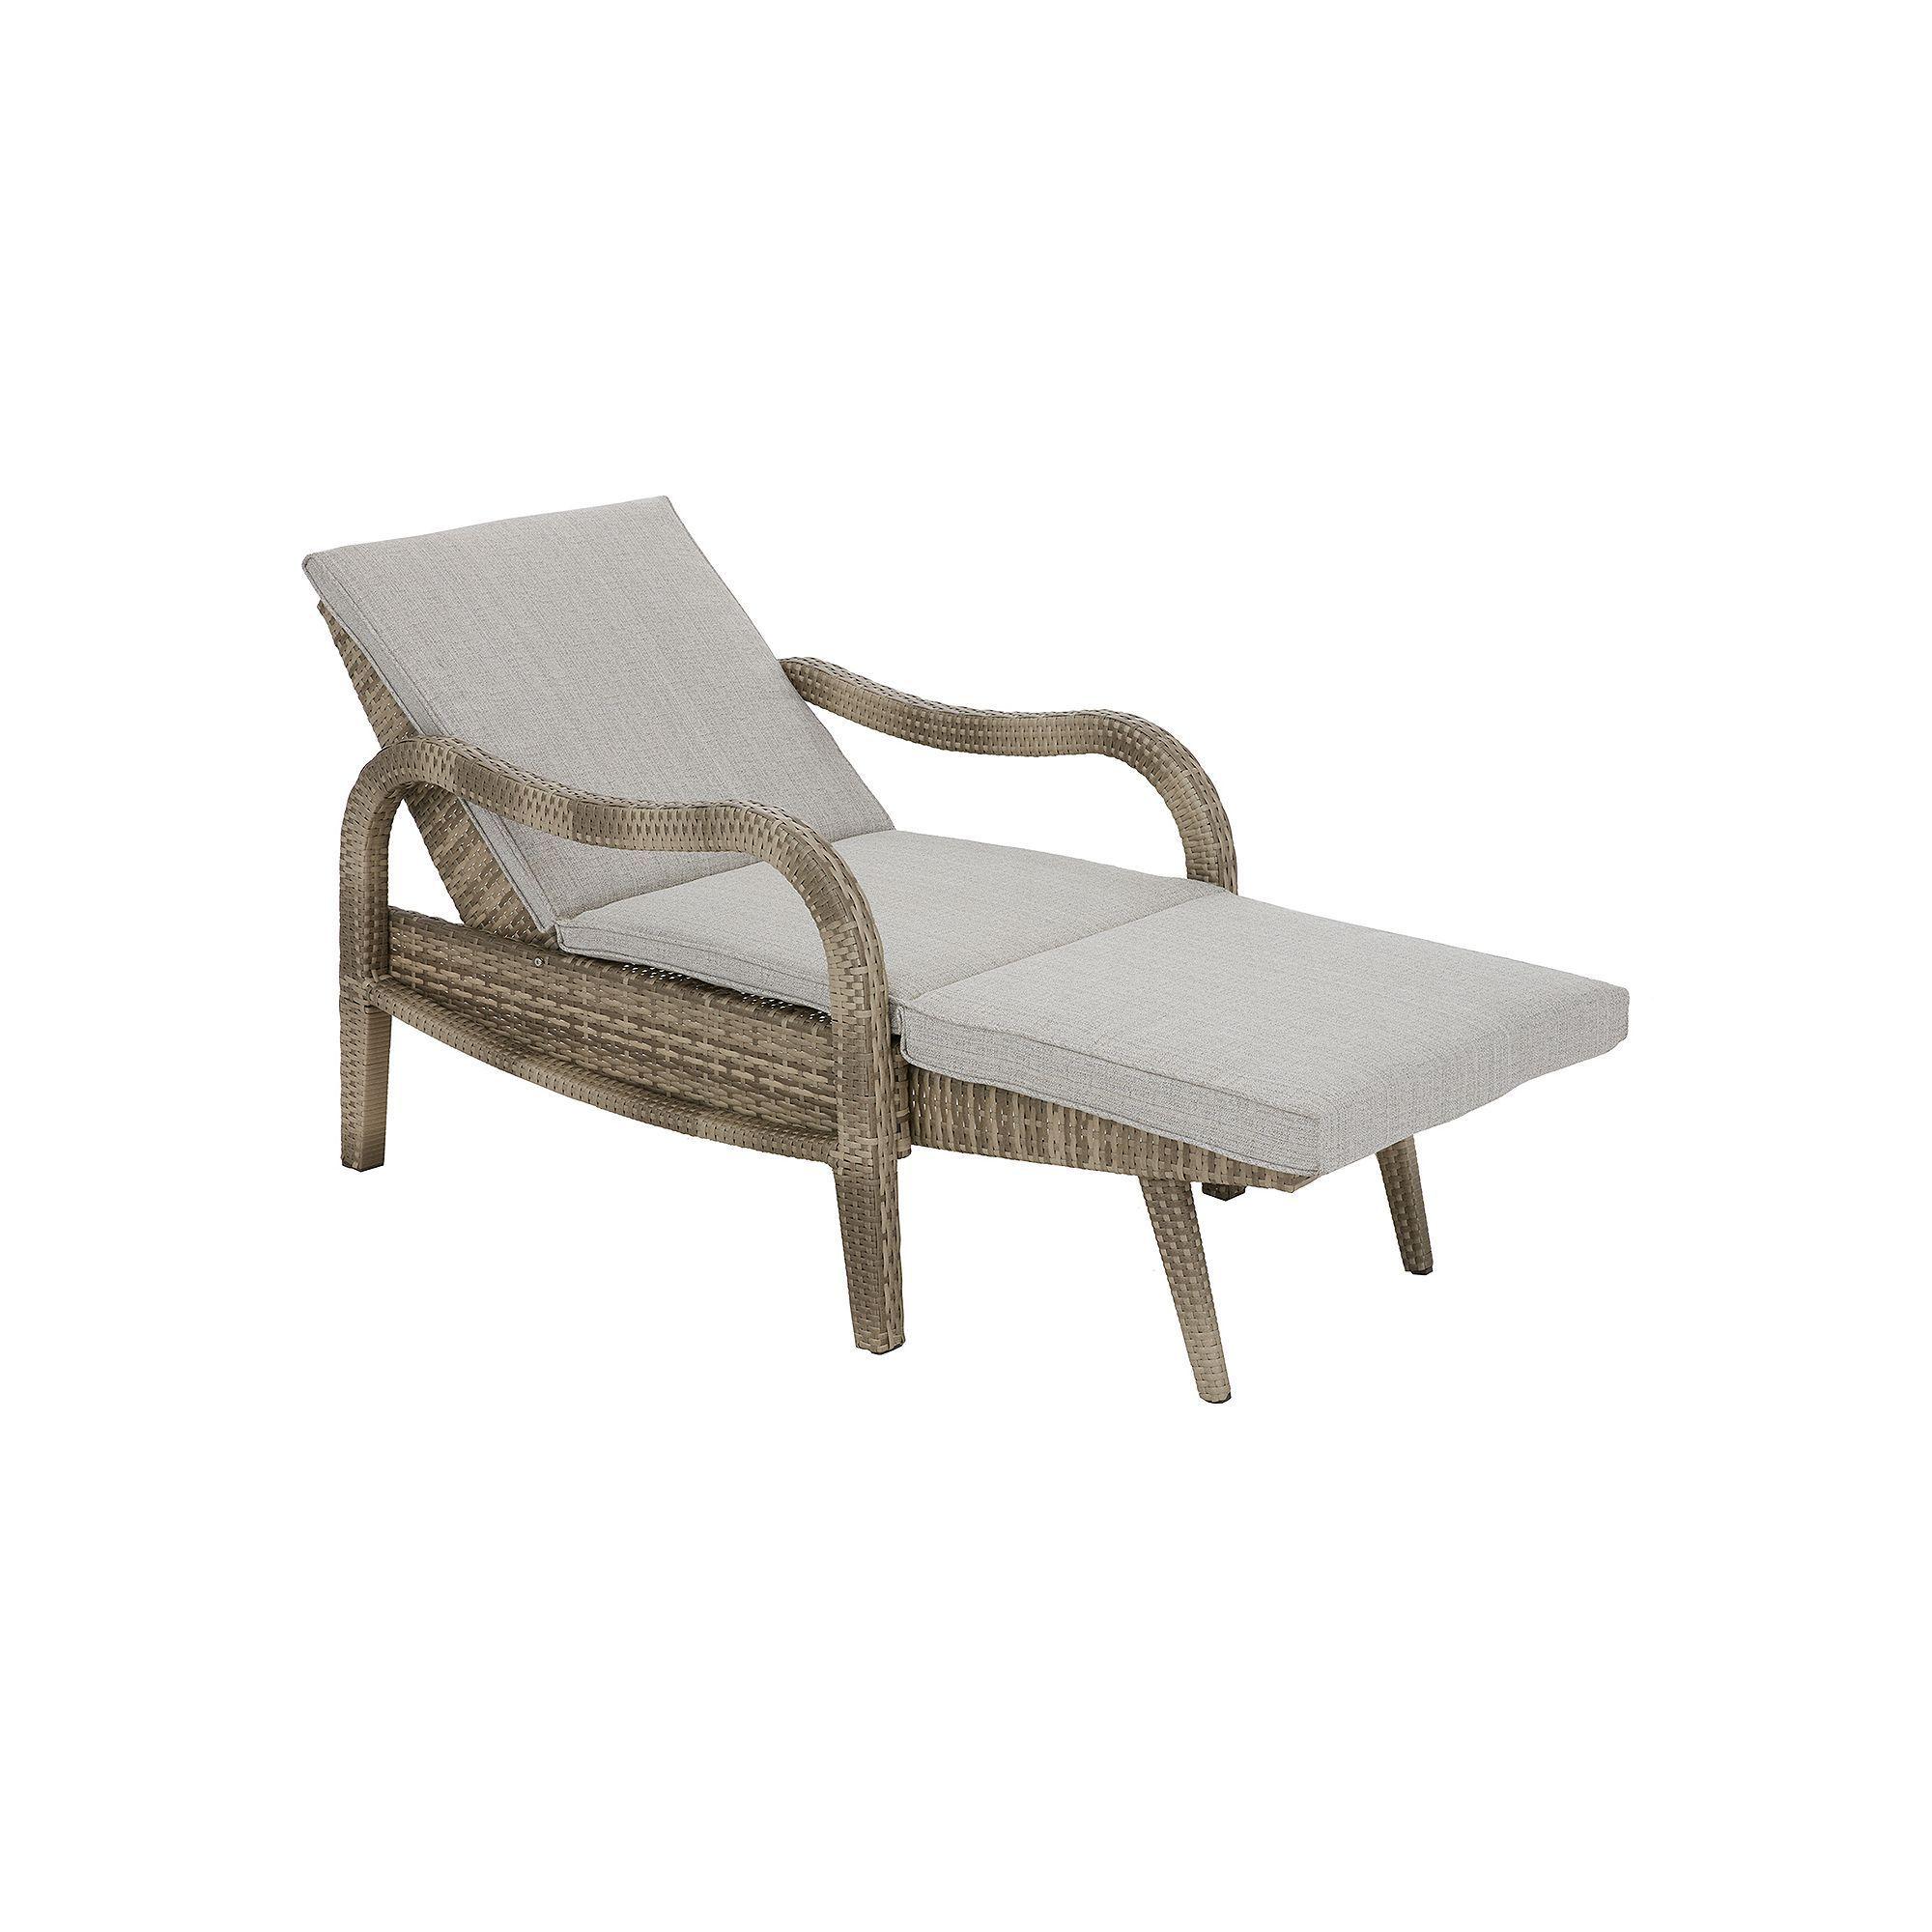 Awesome Madison Park Camden Adjustable Patio Chaise Lounge Chair Creativecarmelina Interior Chair Design Creativecarmelinacom